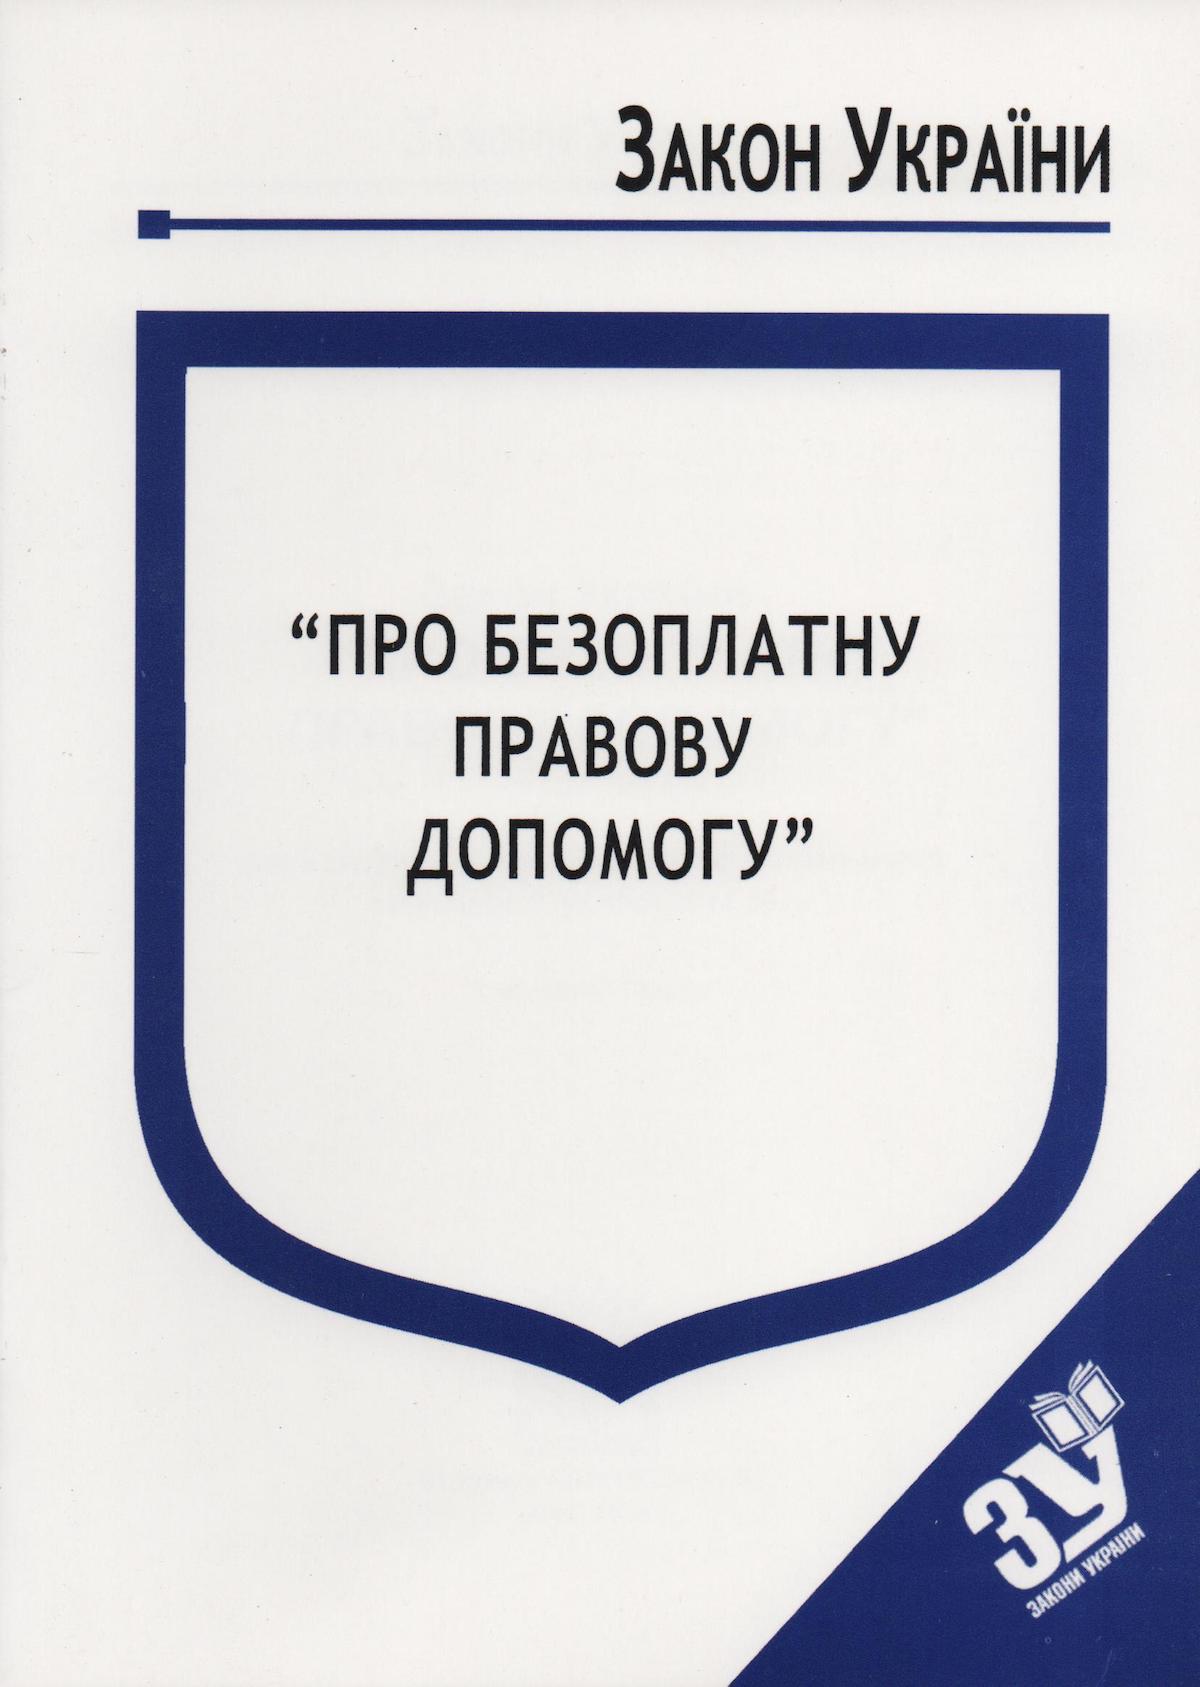 zakon-o-porno-v-ukraine